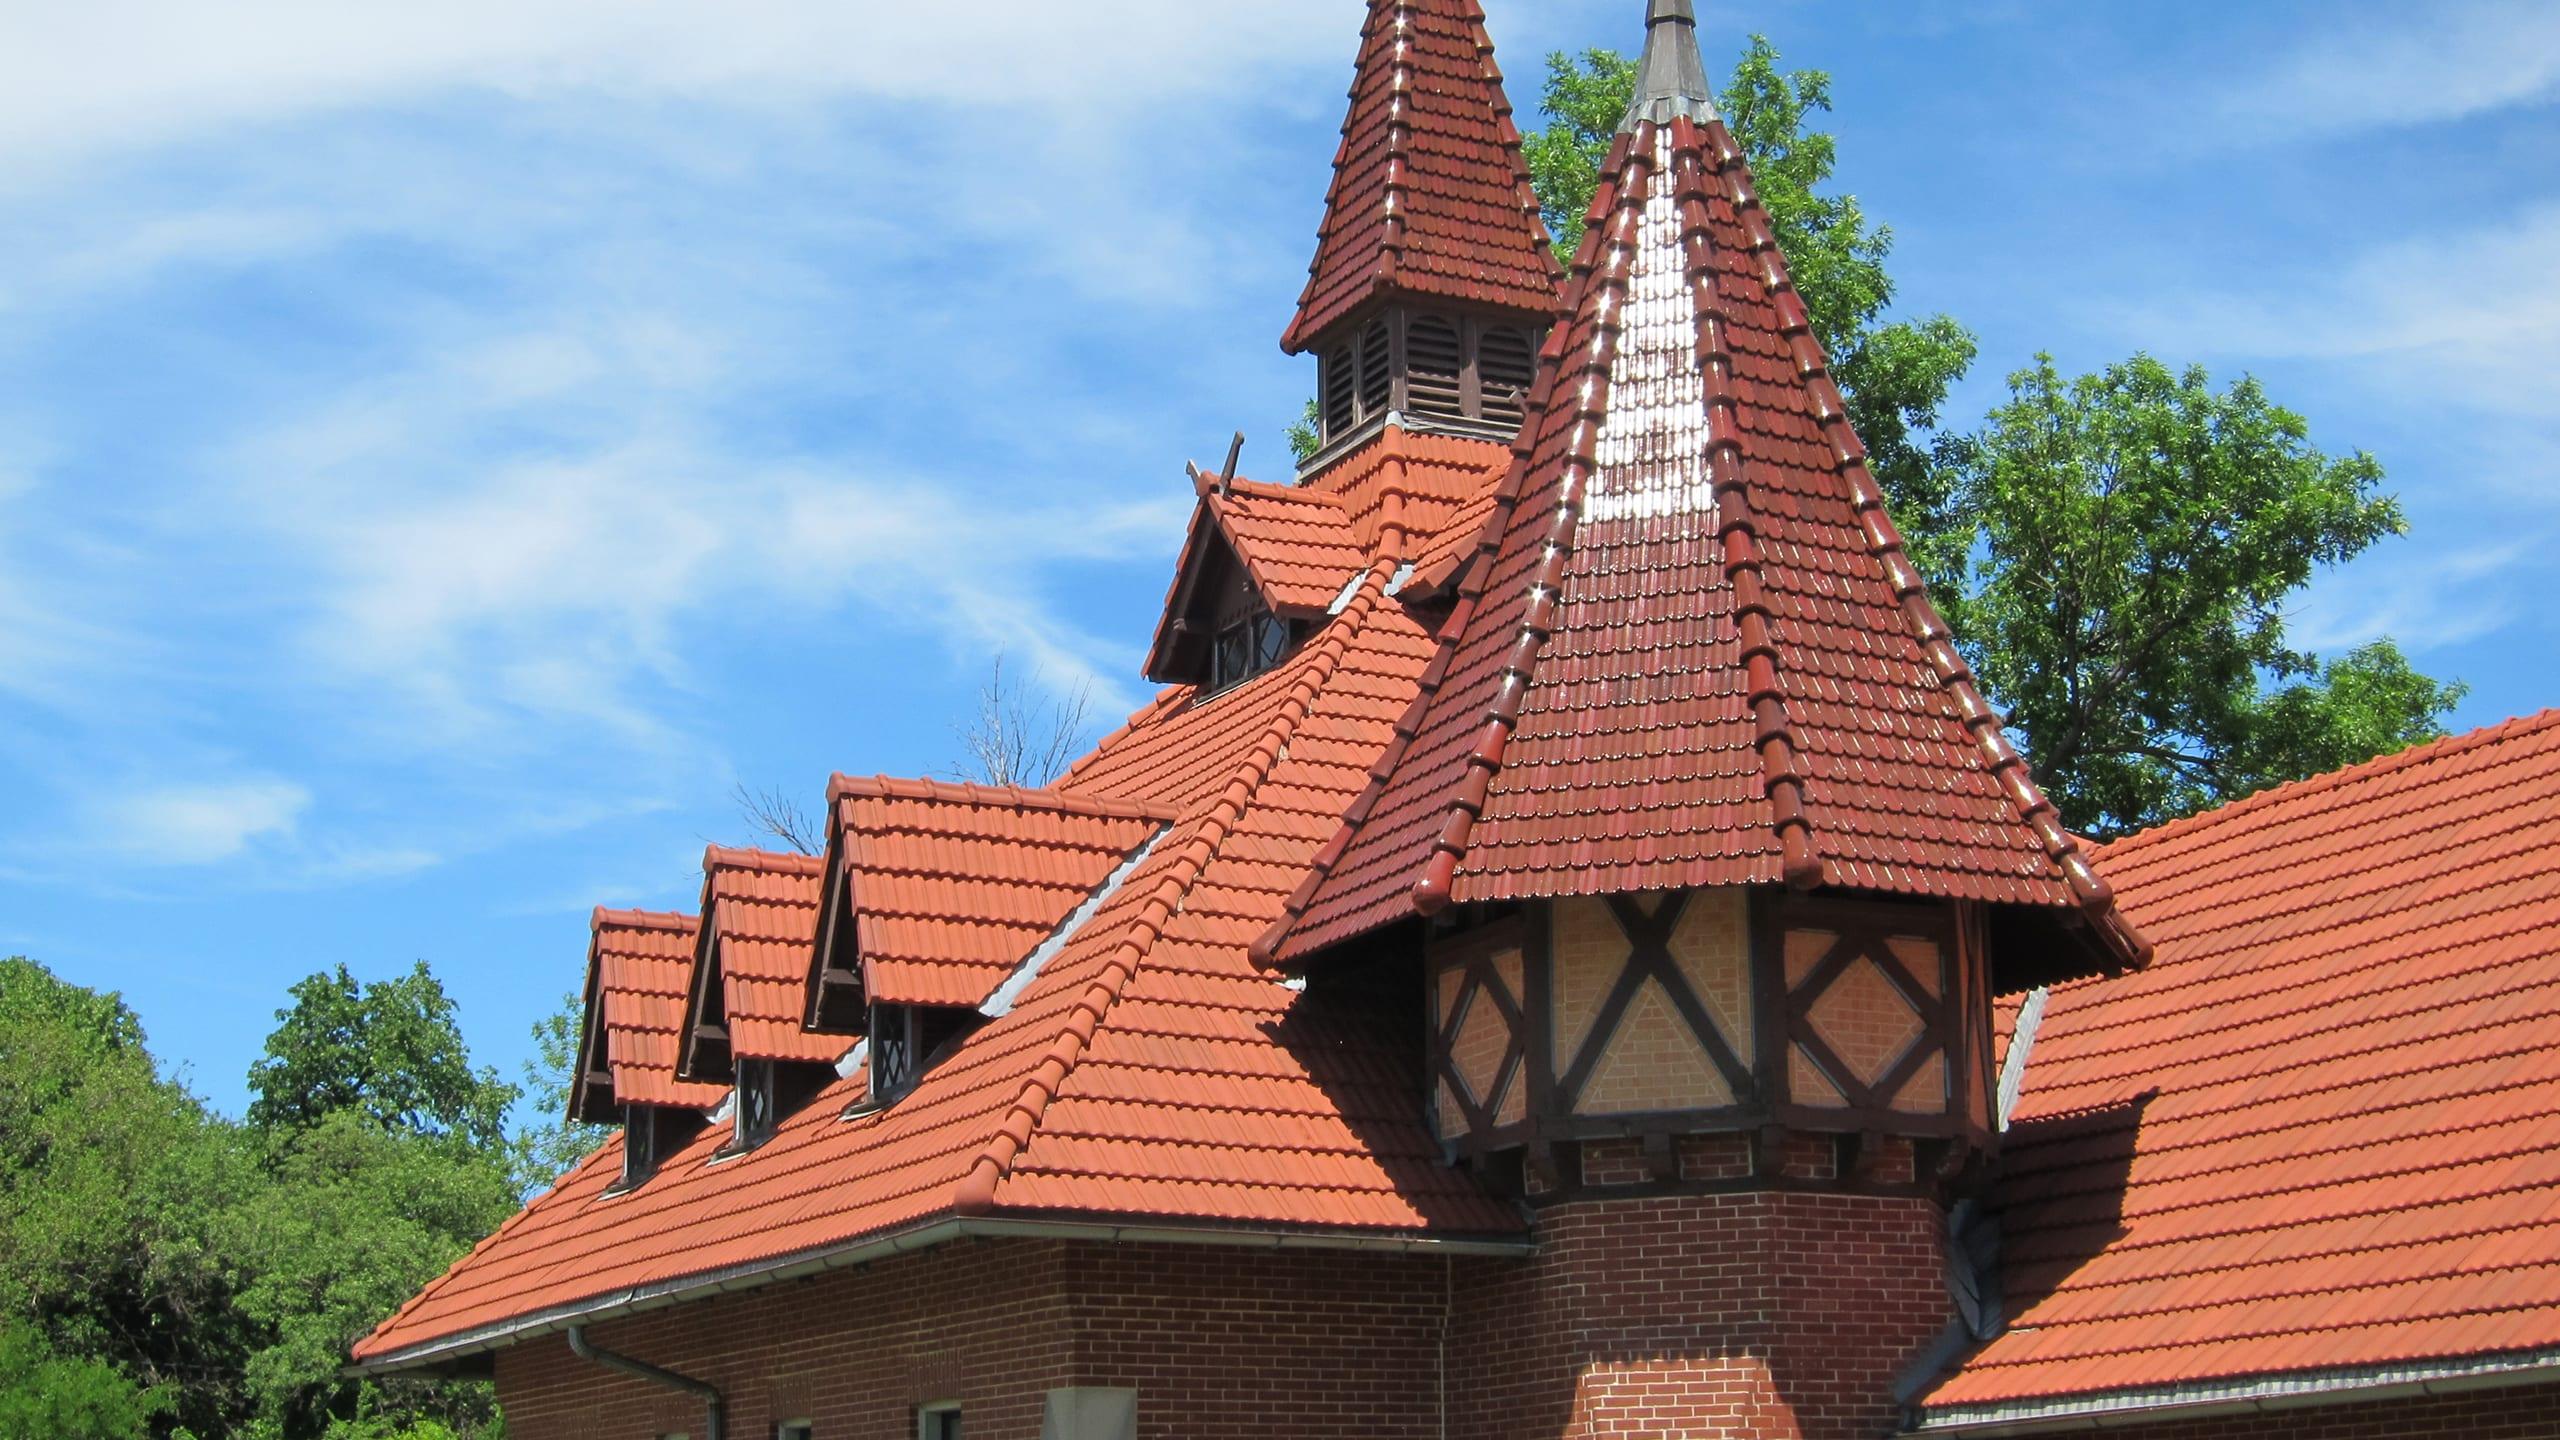 Humboldt Park Stables Ludowici Roof Tile